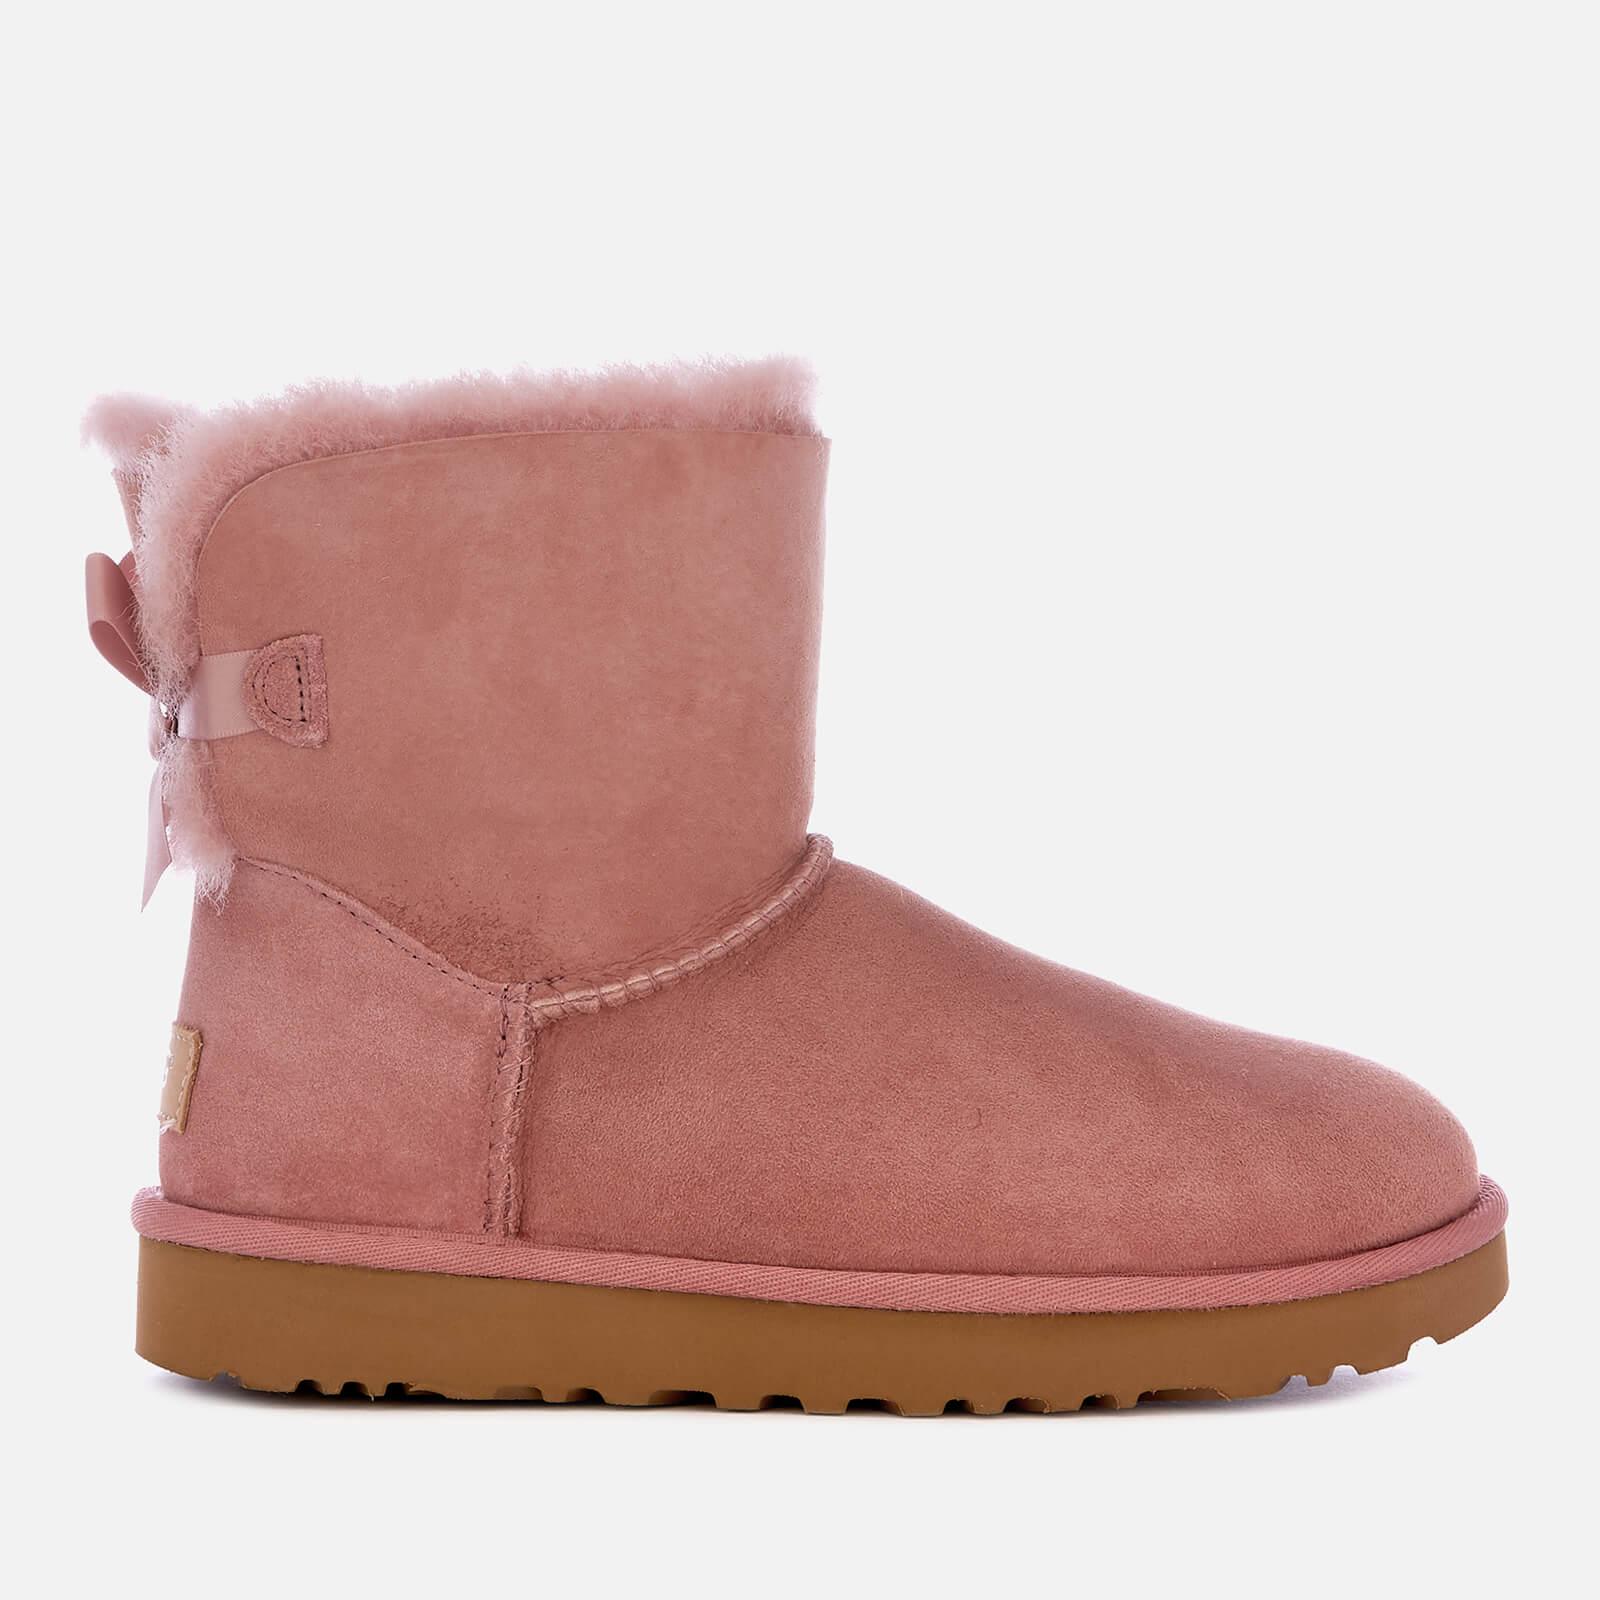 9e6ab9364ff UGG Women's Mini Bailey Bow II Sheepskin Boots - Pink Dawn Clothing |  TheHut.com